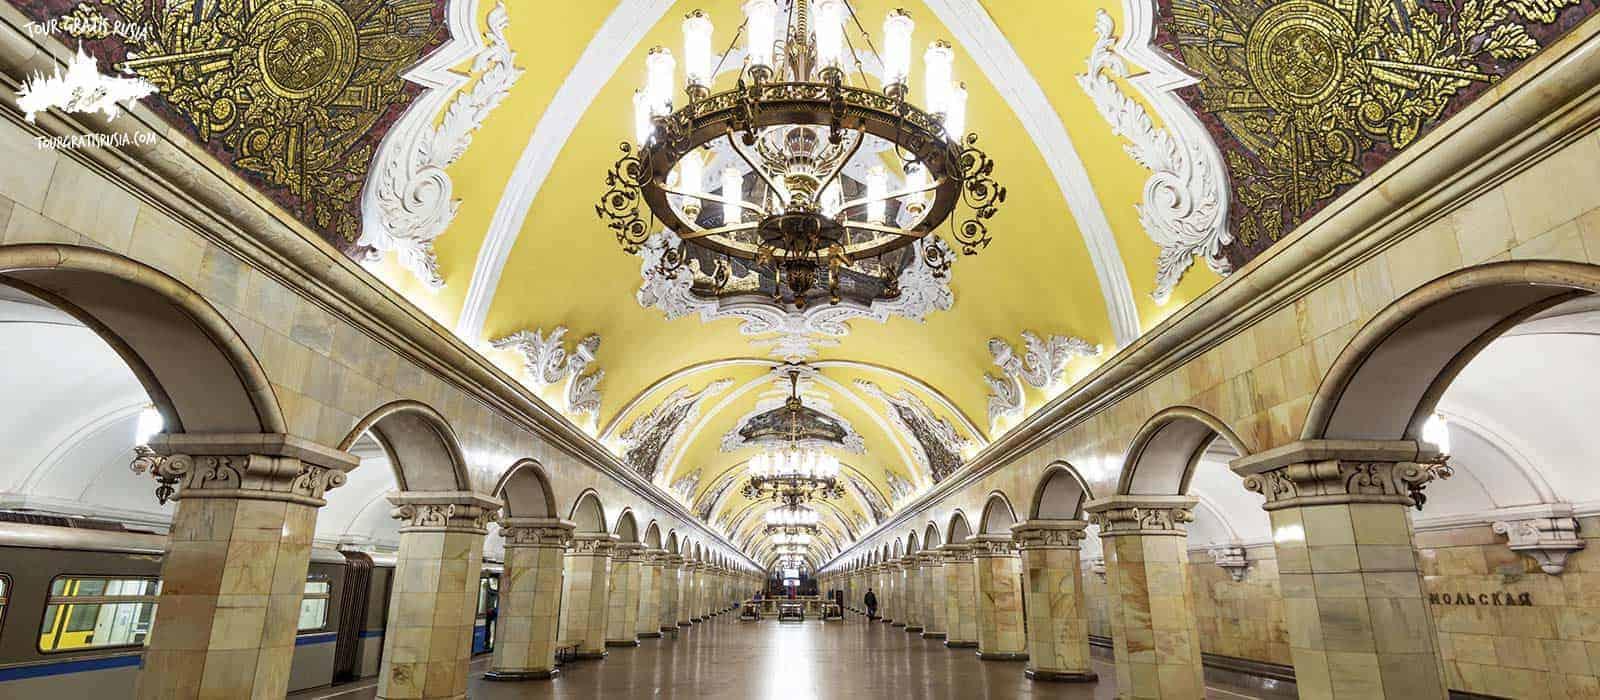 Tour Paquete corto centro-gratis y Metro de Moscú